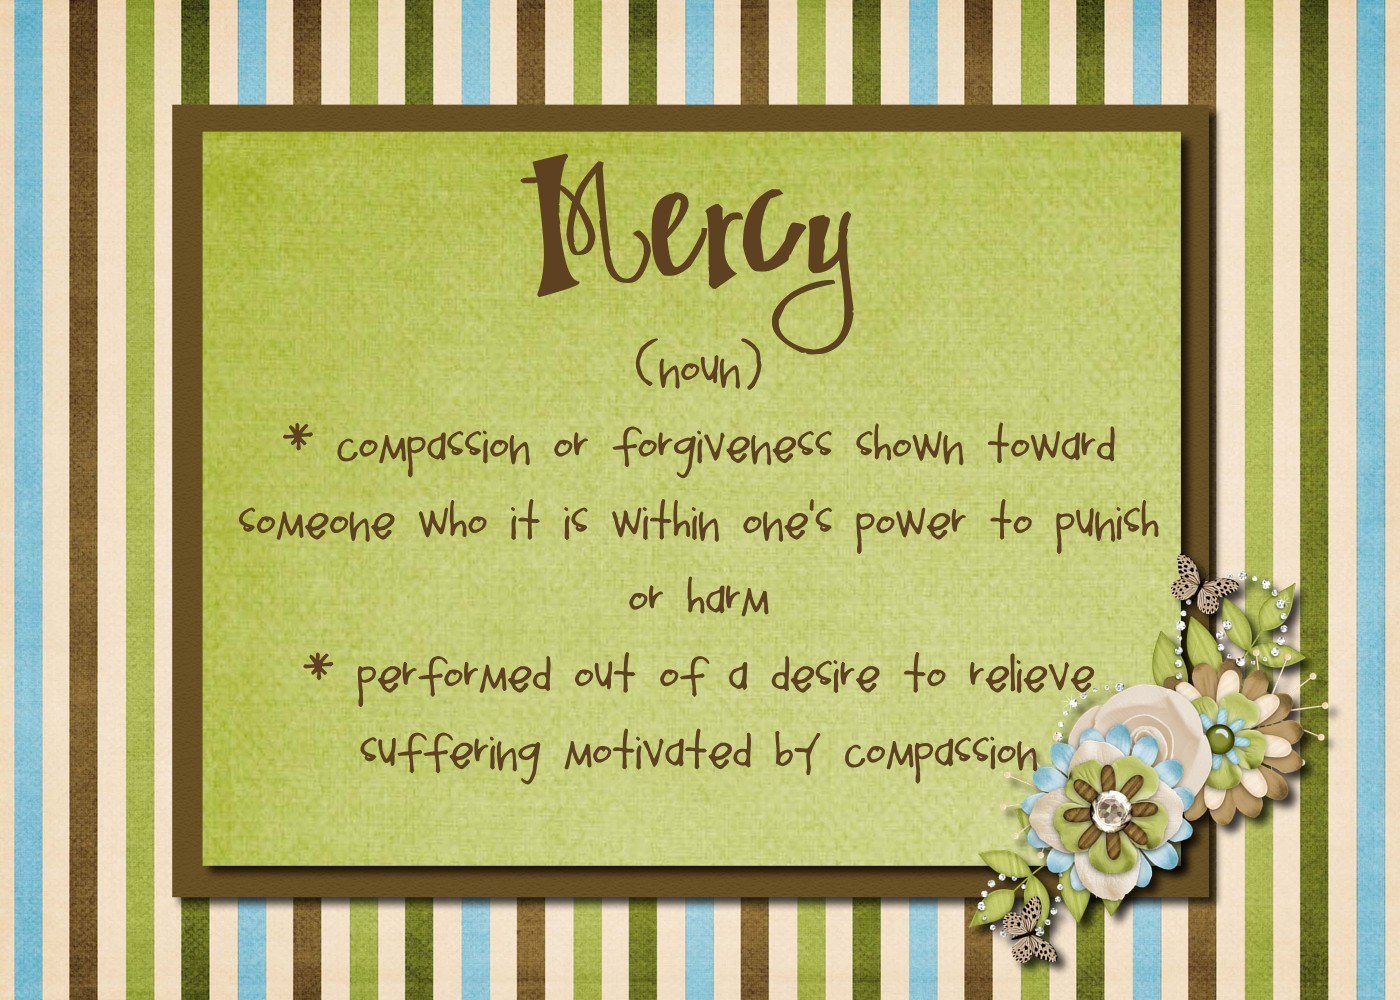 manufacturer's handbook: mercy -- mercy is not something god has